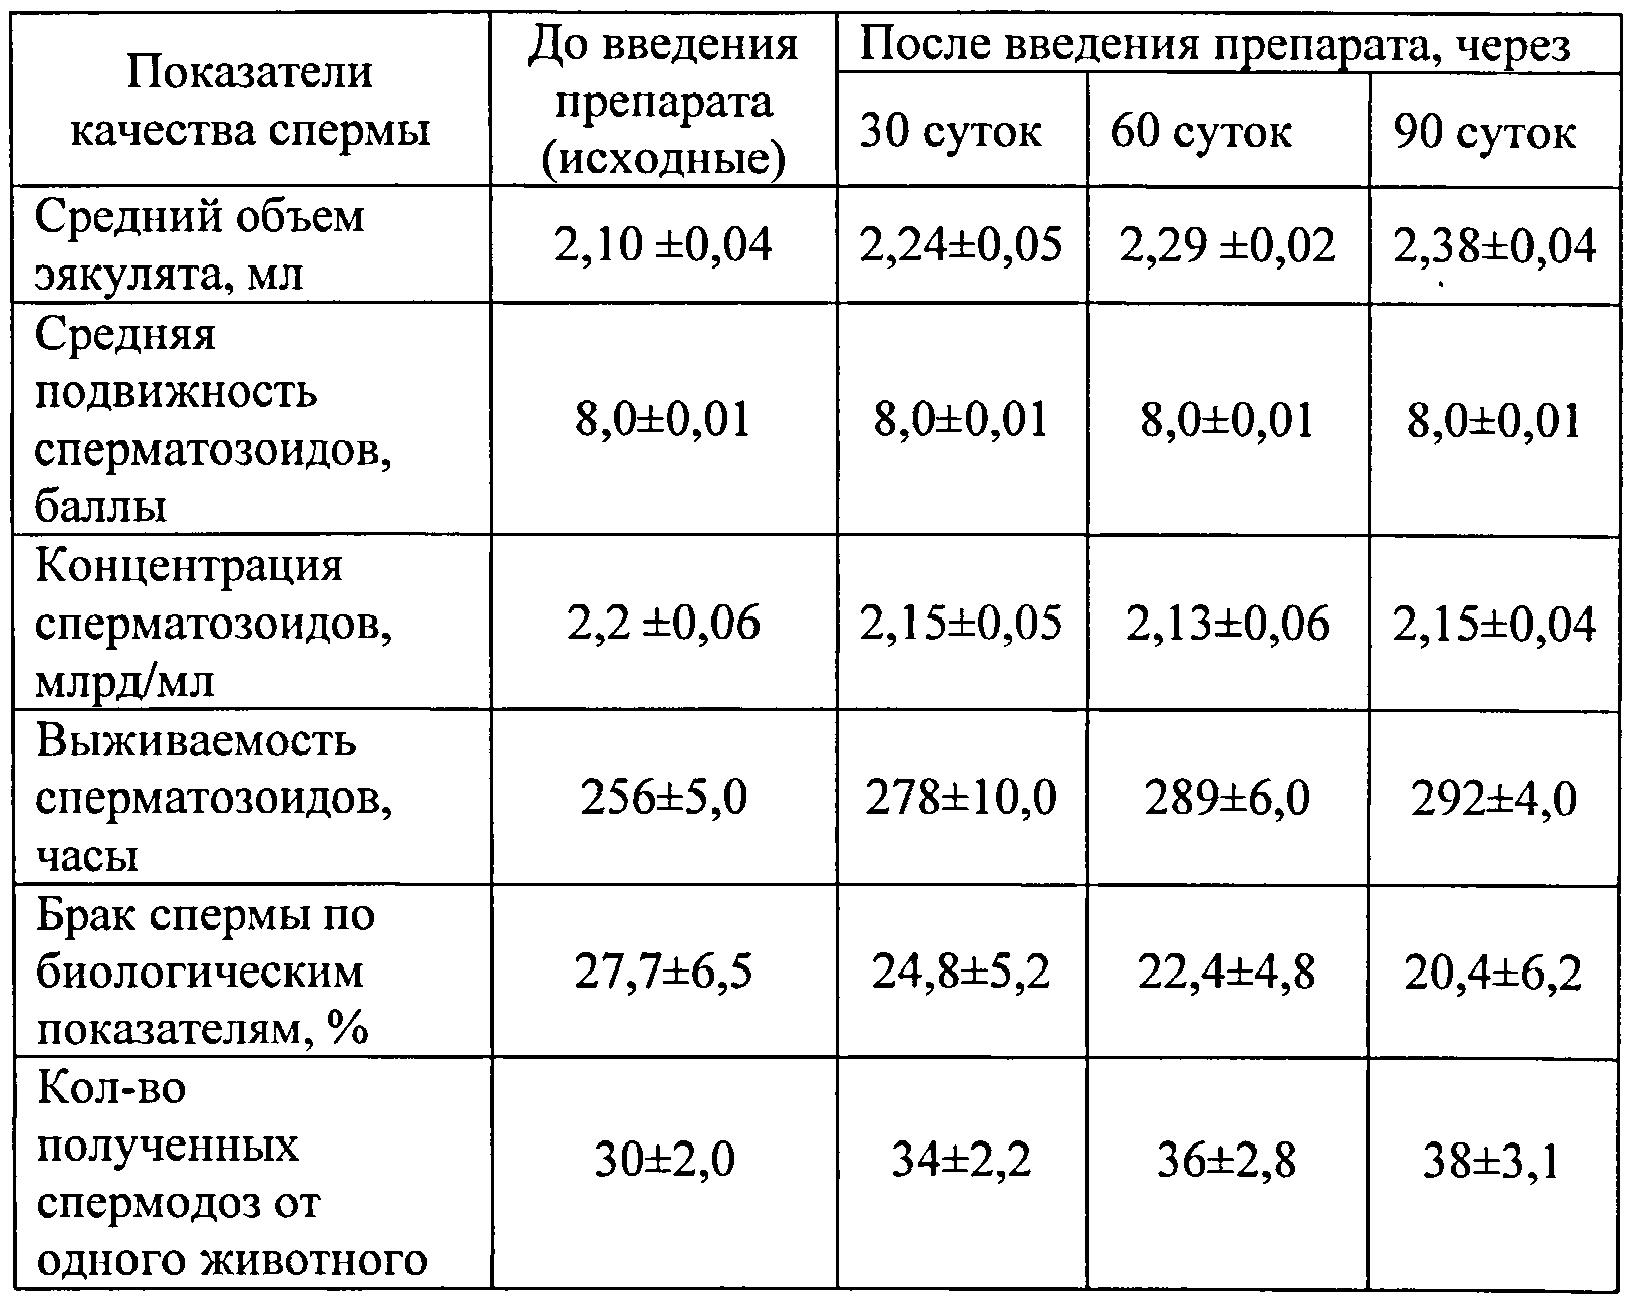 pizda-tolstoy-zhenshini-video